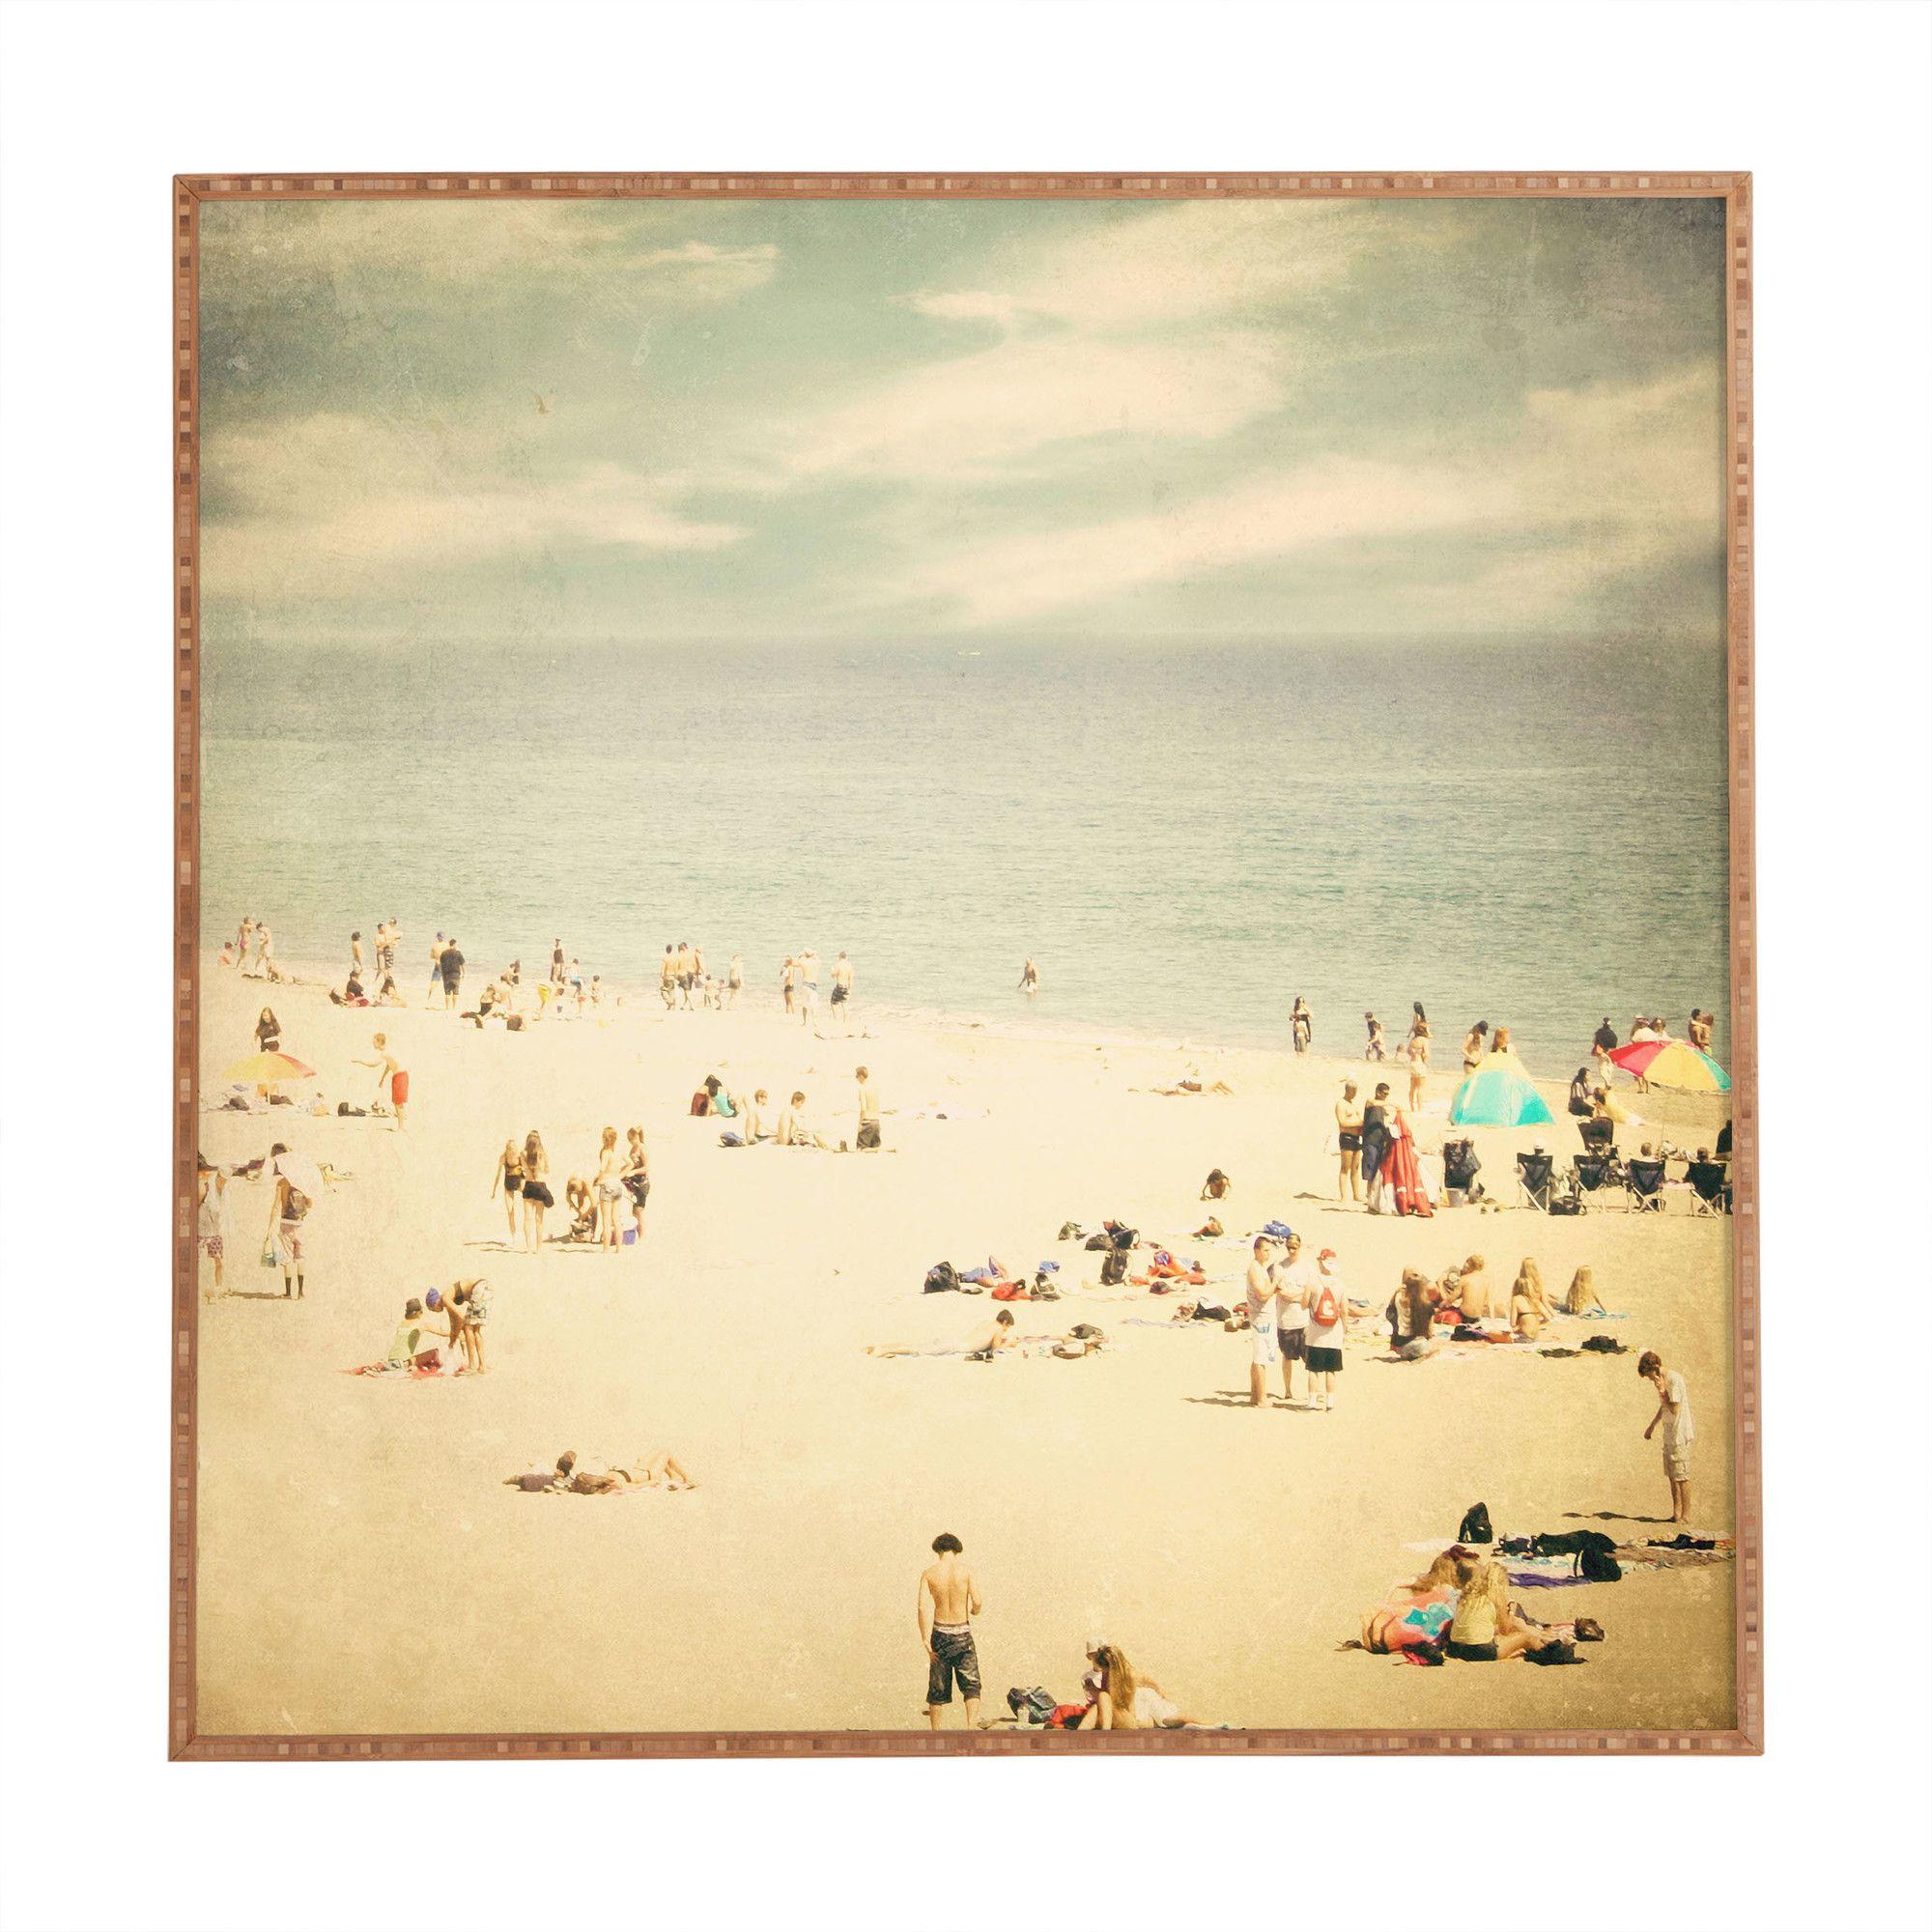 DENY Designs Vintage Beach by Shannon Clark Framed Wall Art ...